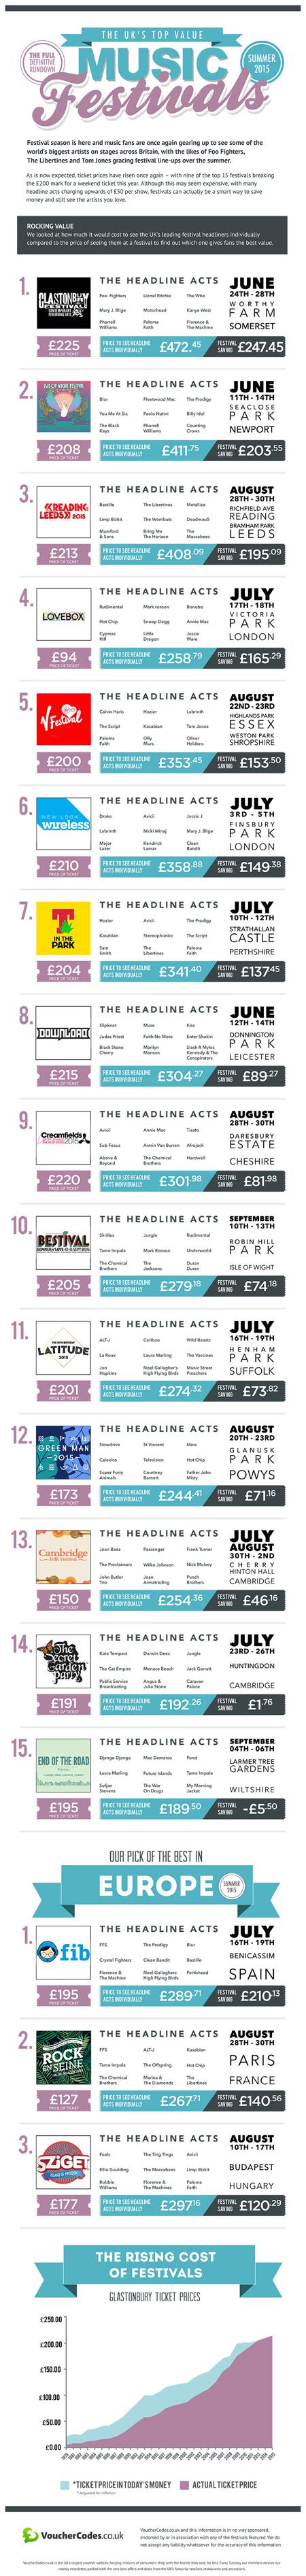 2015 Festival Savings